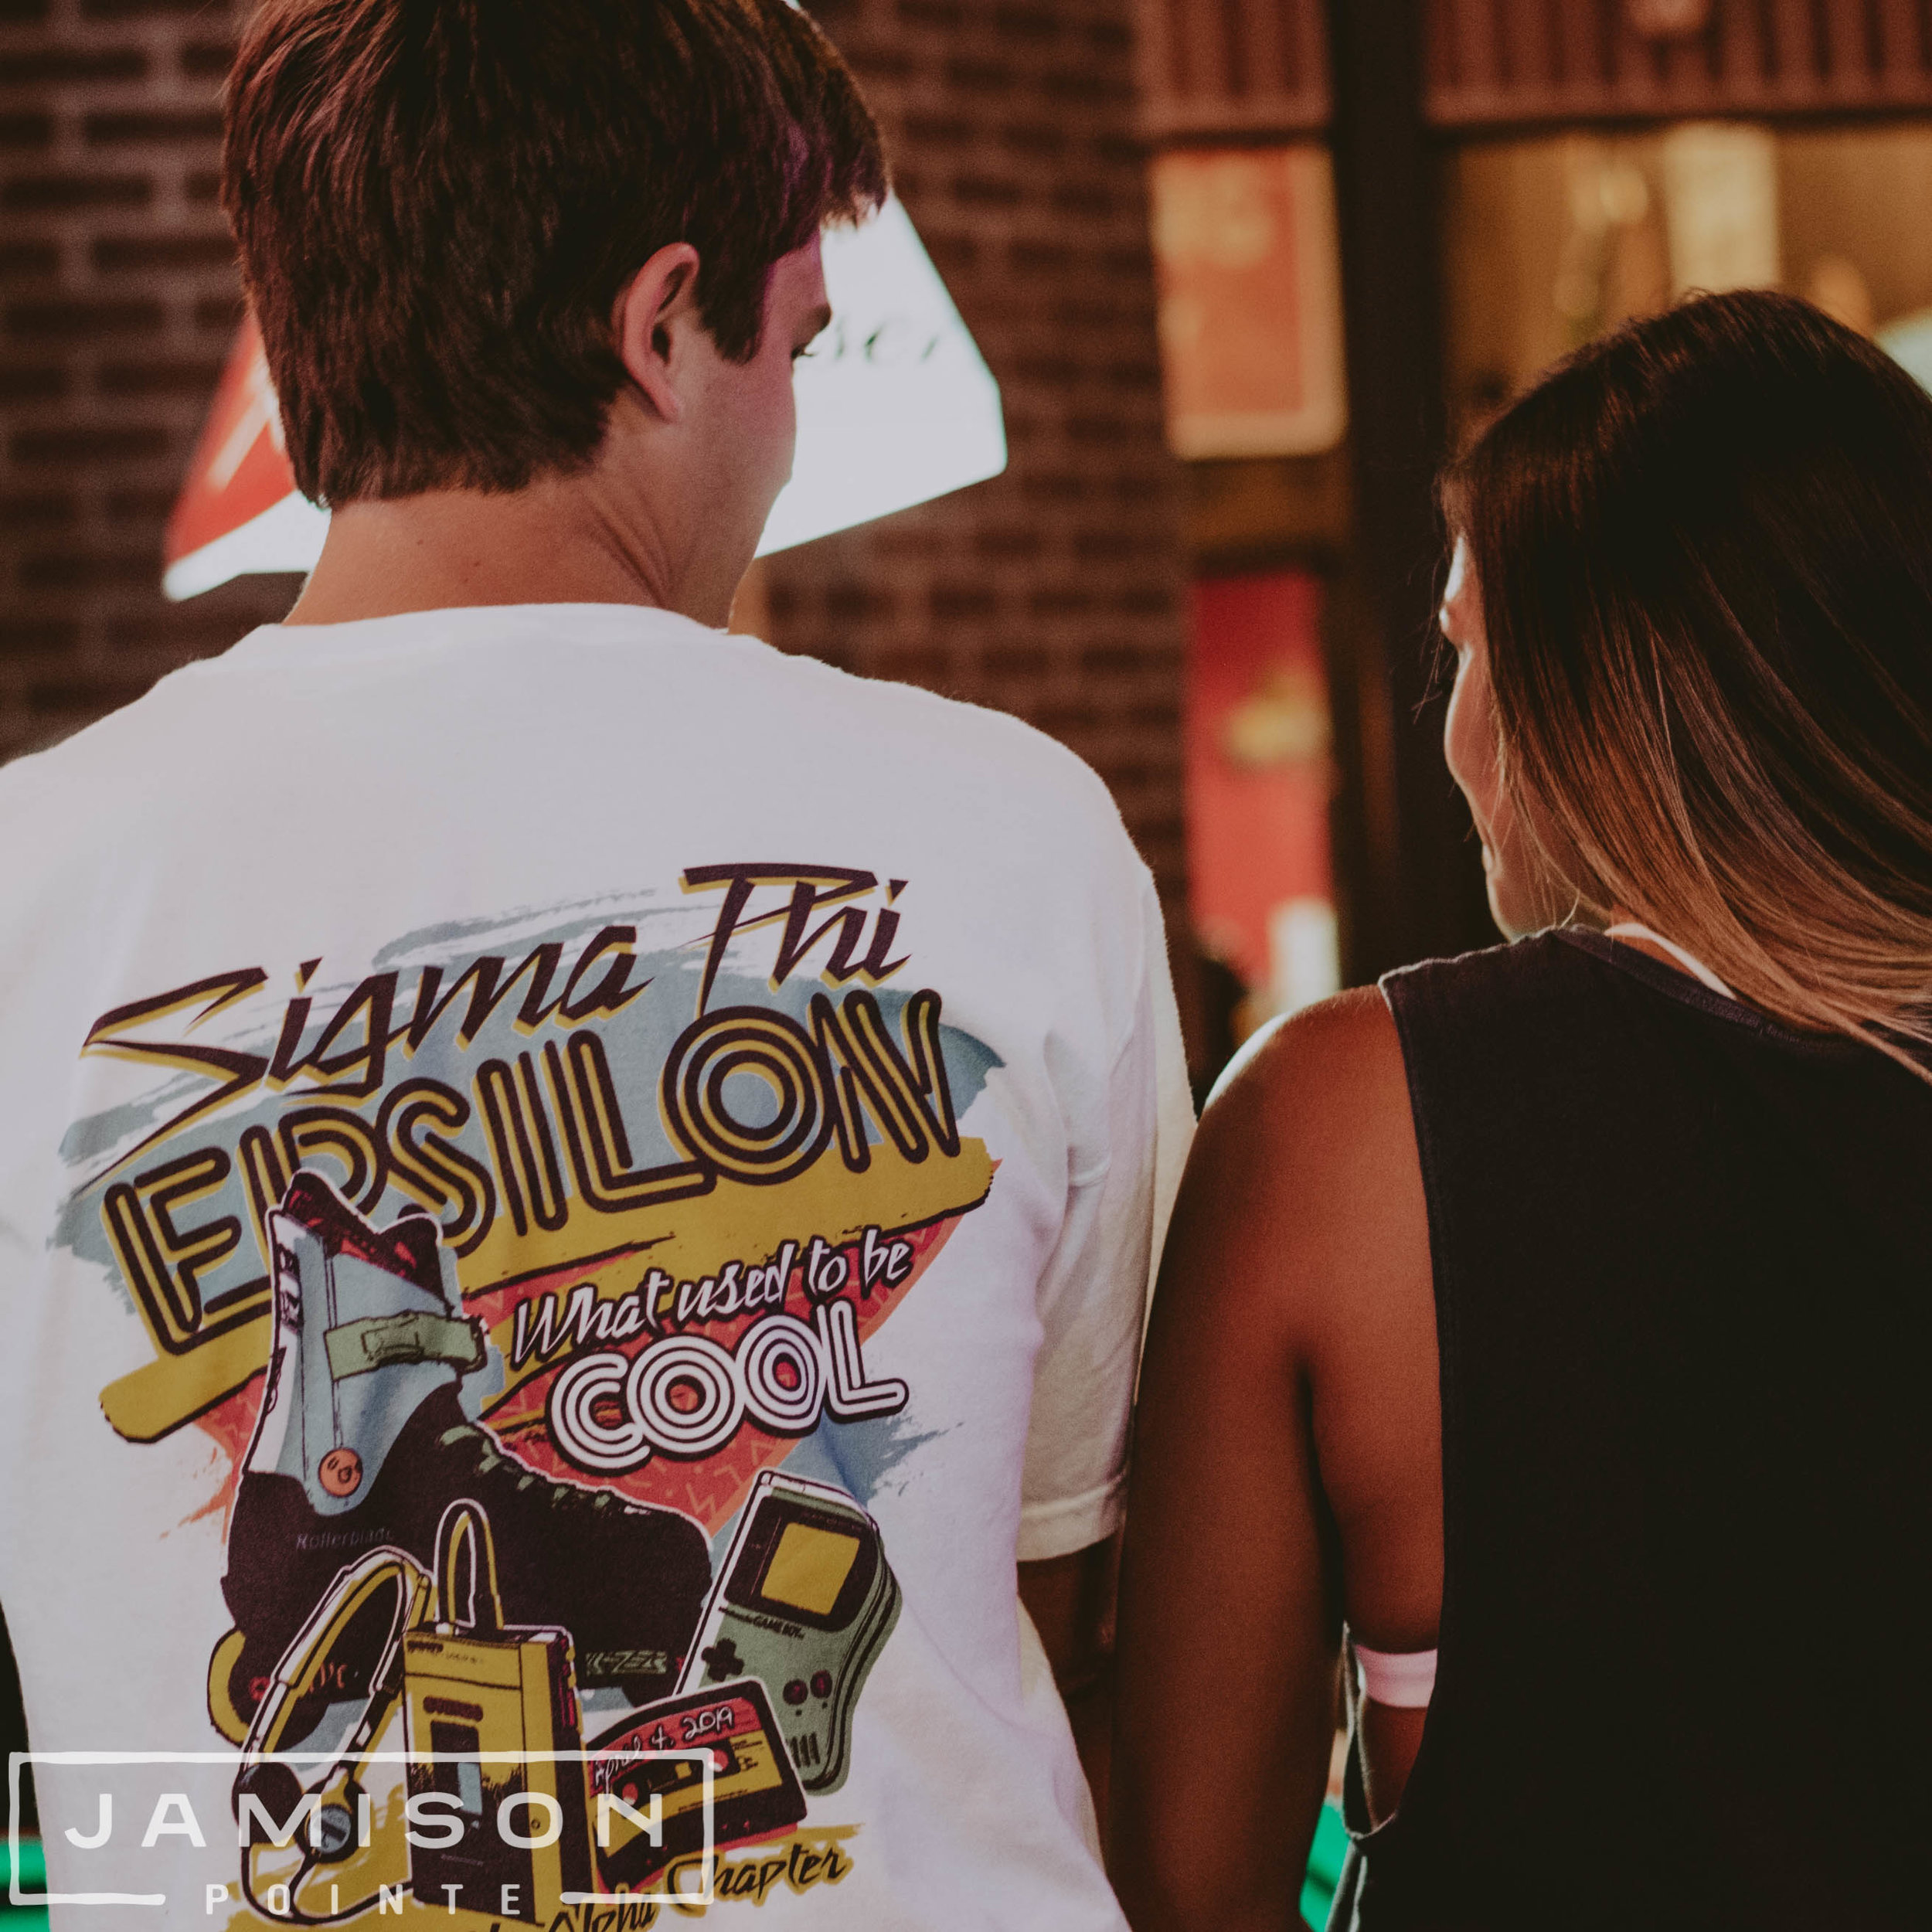 Sigma Phi Epsilon What Used To Be Cool Tshirt